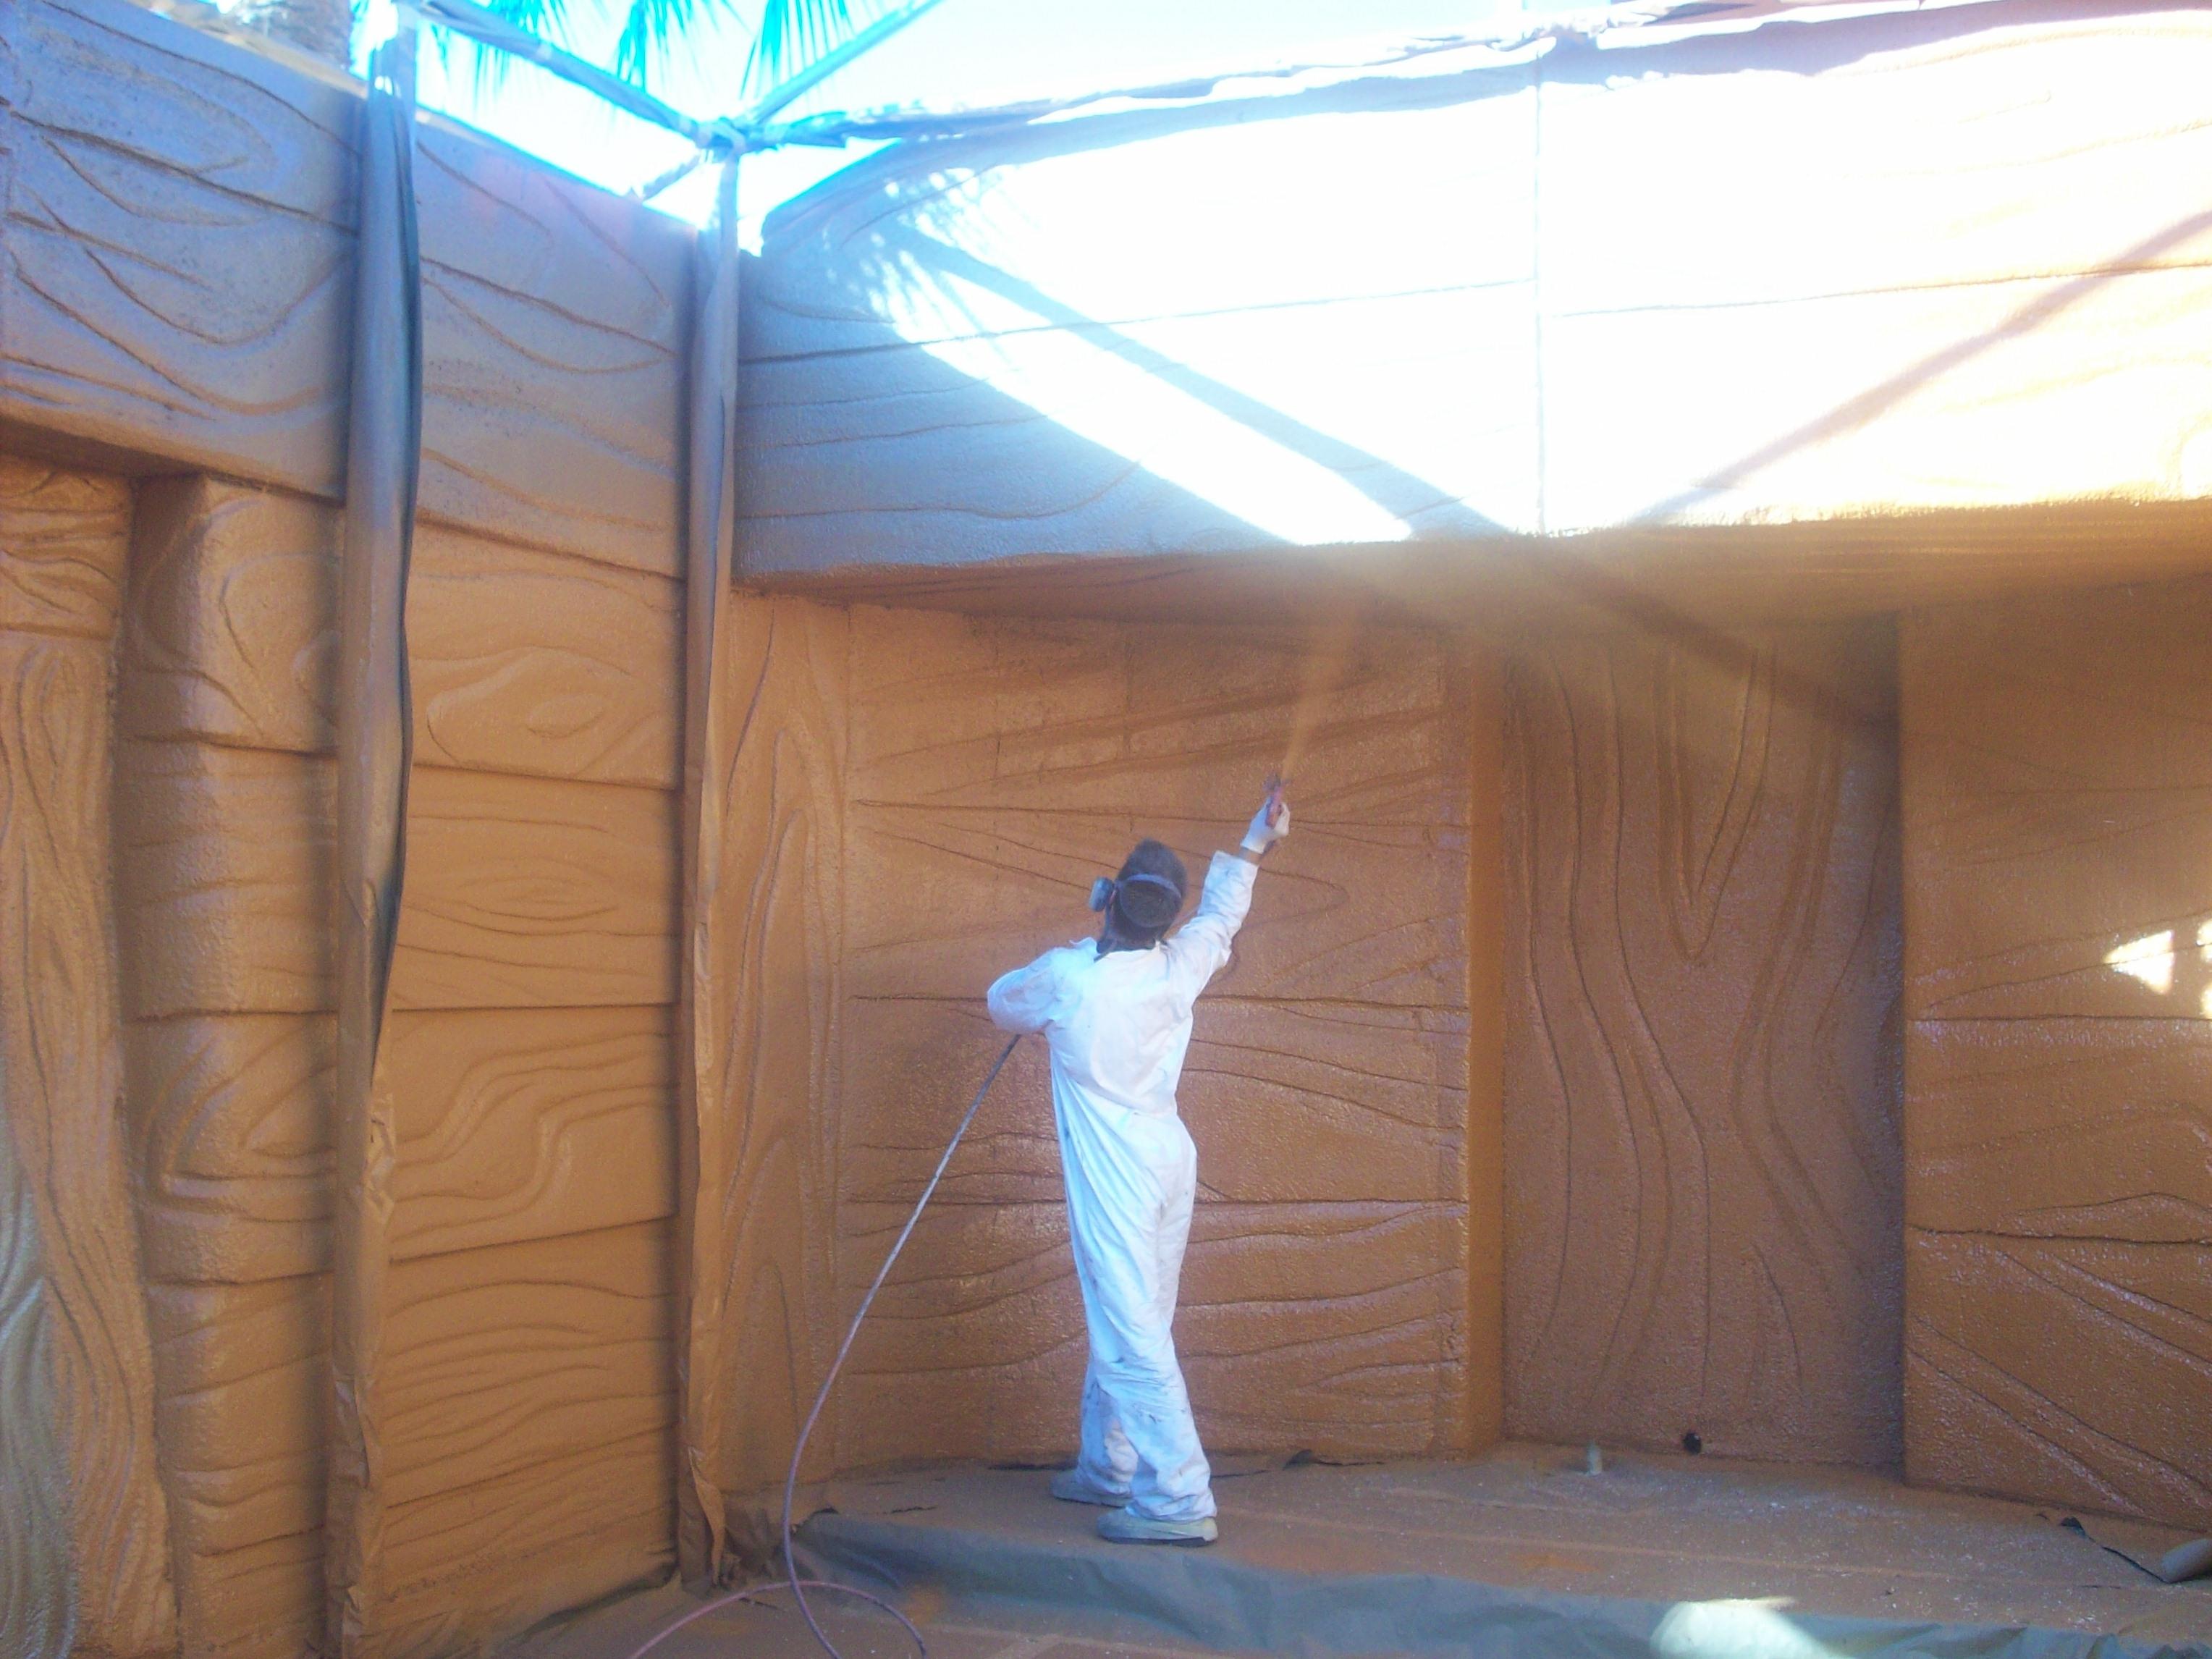 Foam Hardcoating | Polyurea Coating Experts - Hotspray